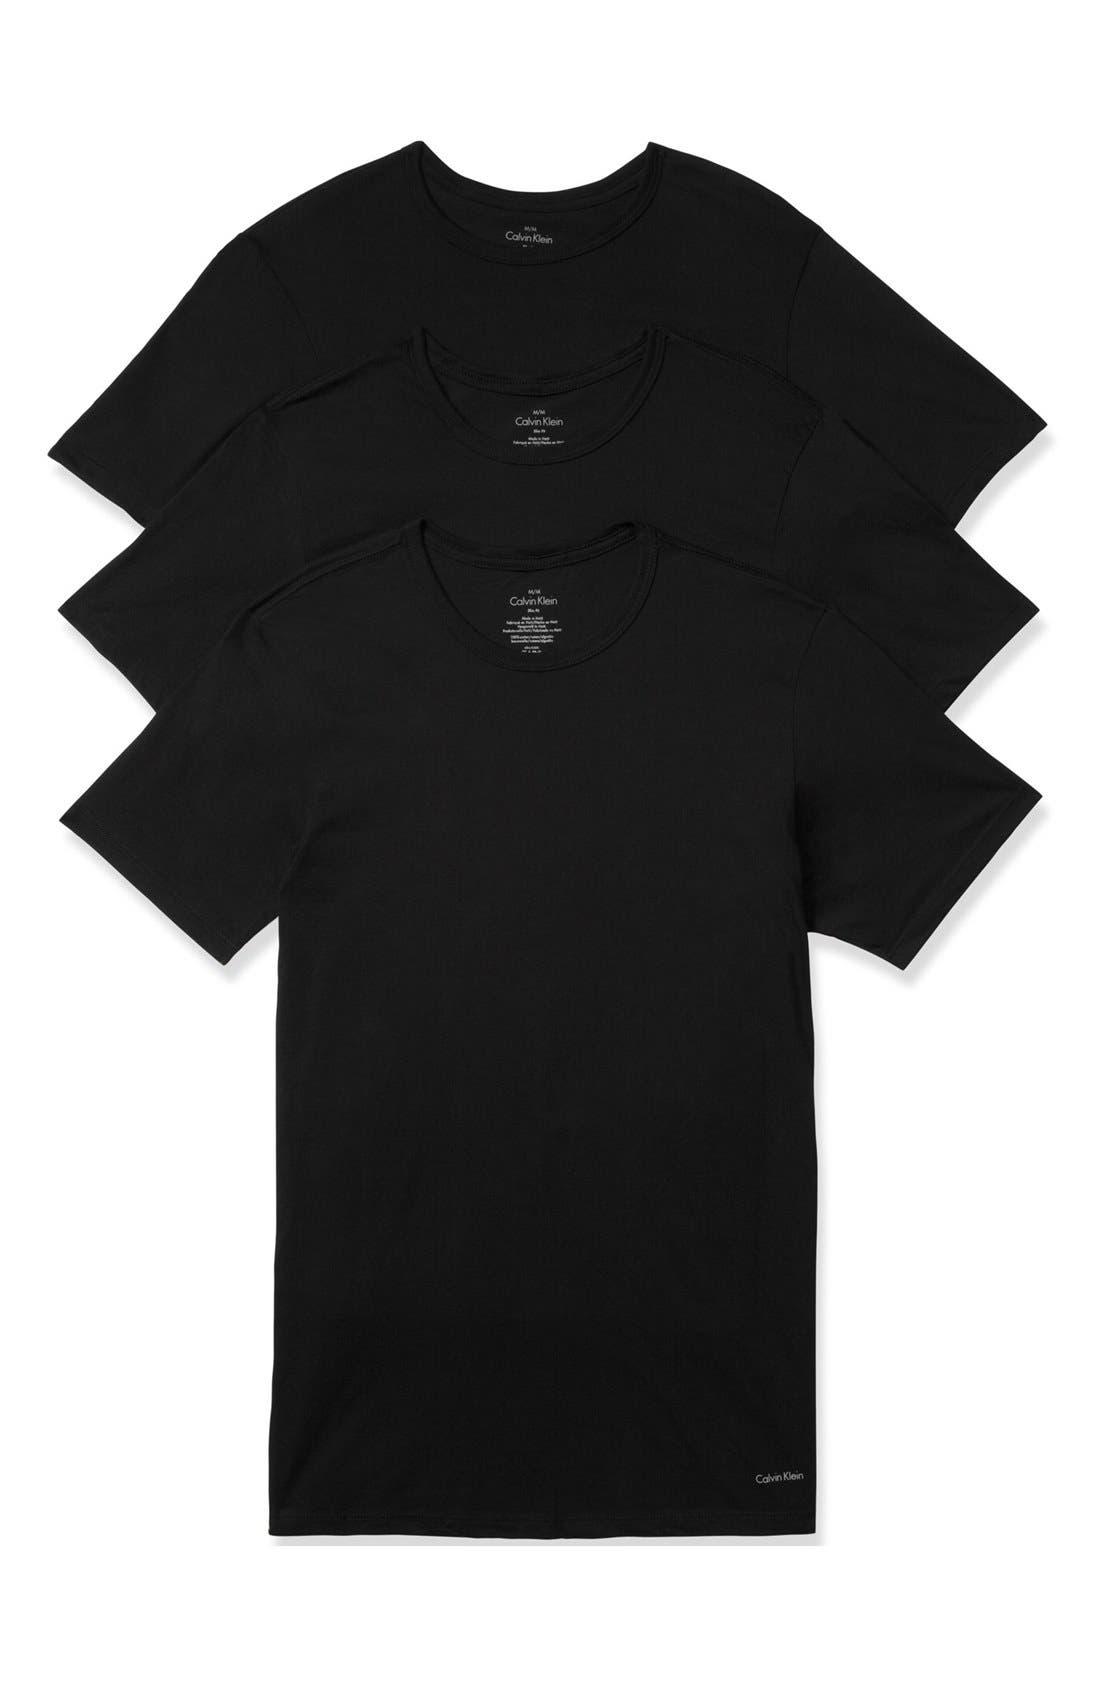 Alternate Image 1 Selected - Calvin Klein Slim Fit 3-Pack Cotton T-Shirt